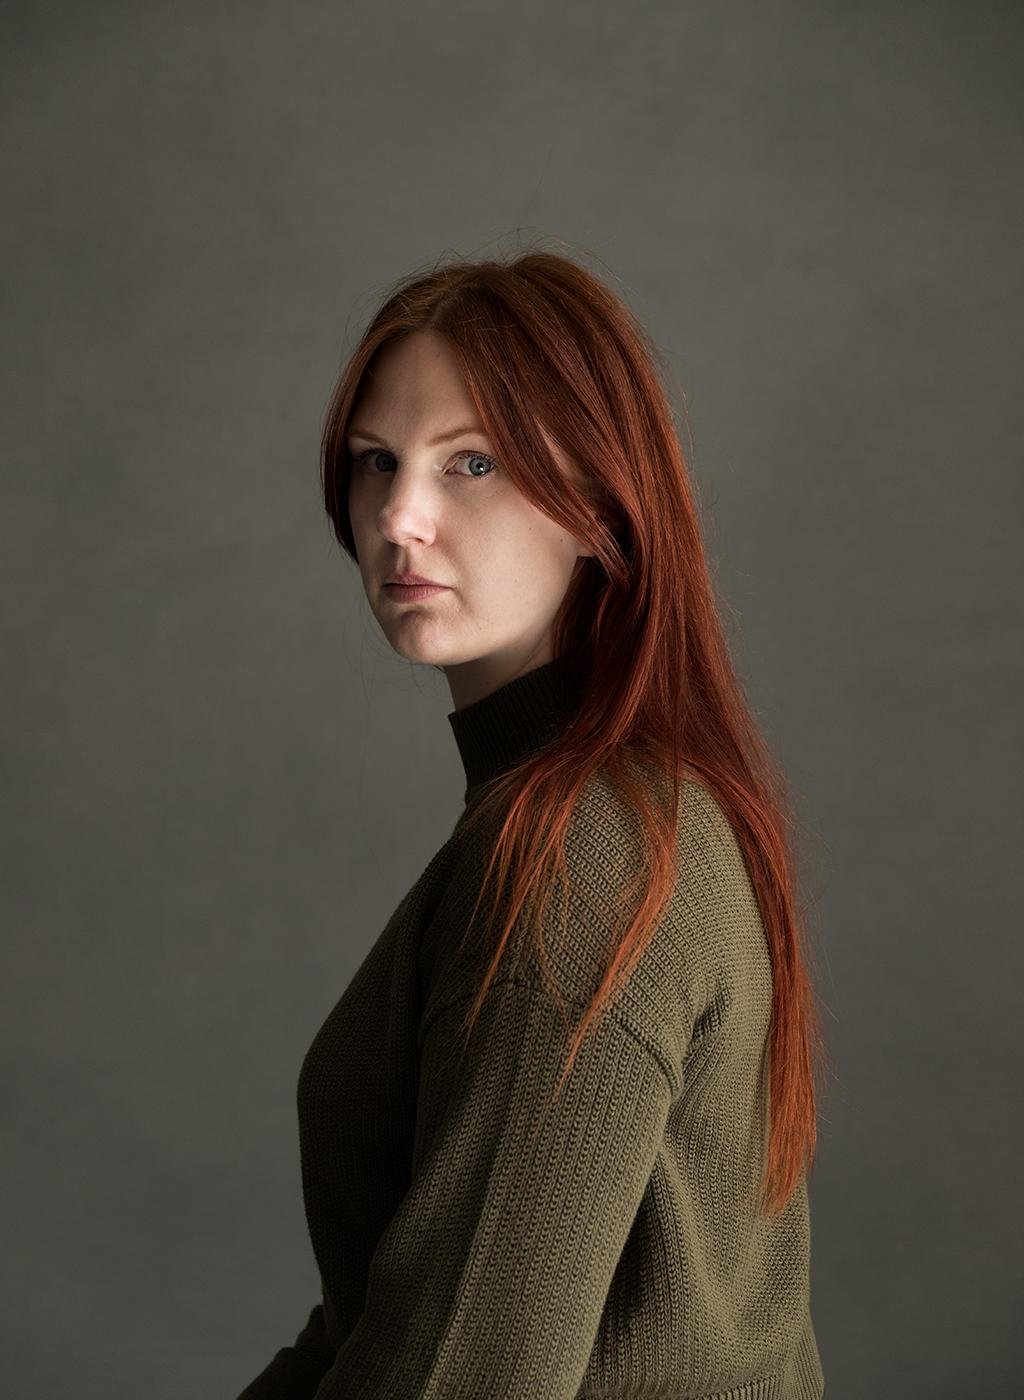 portrait, Susanne Middelberg, portetfotografie, portret